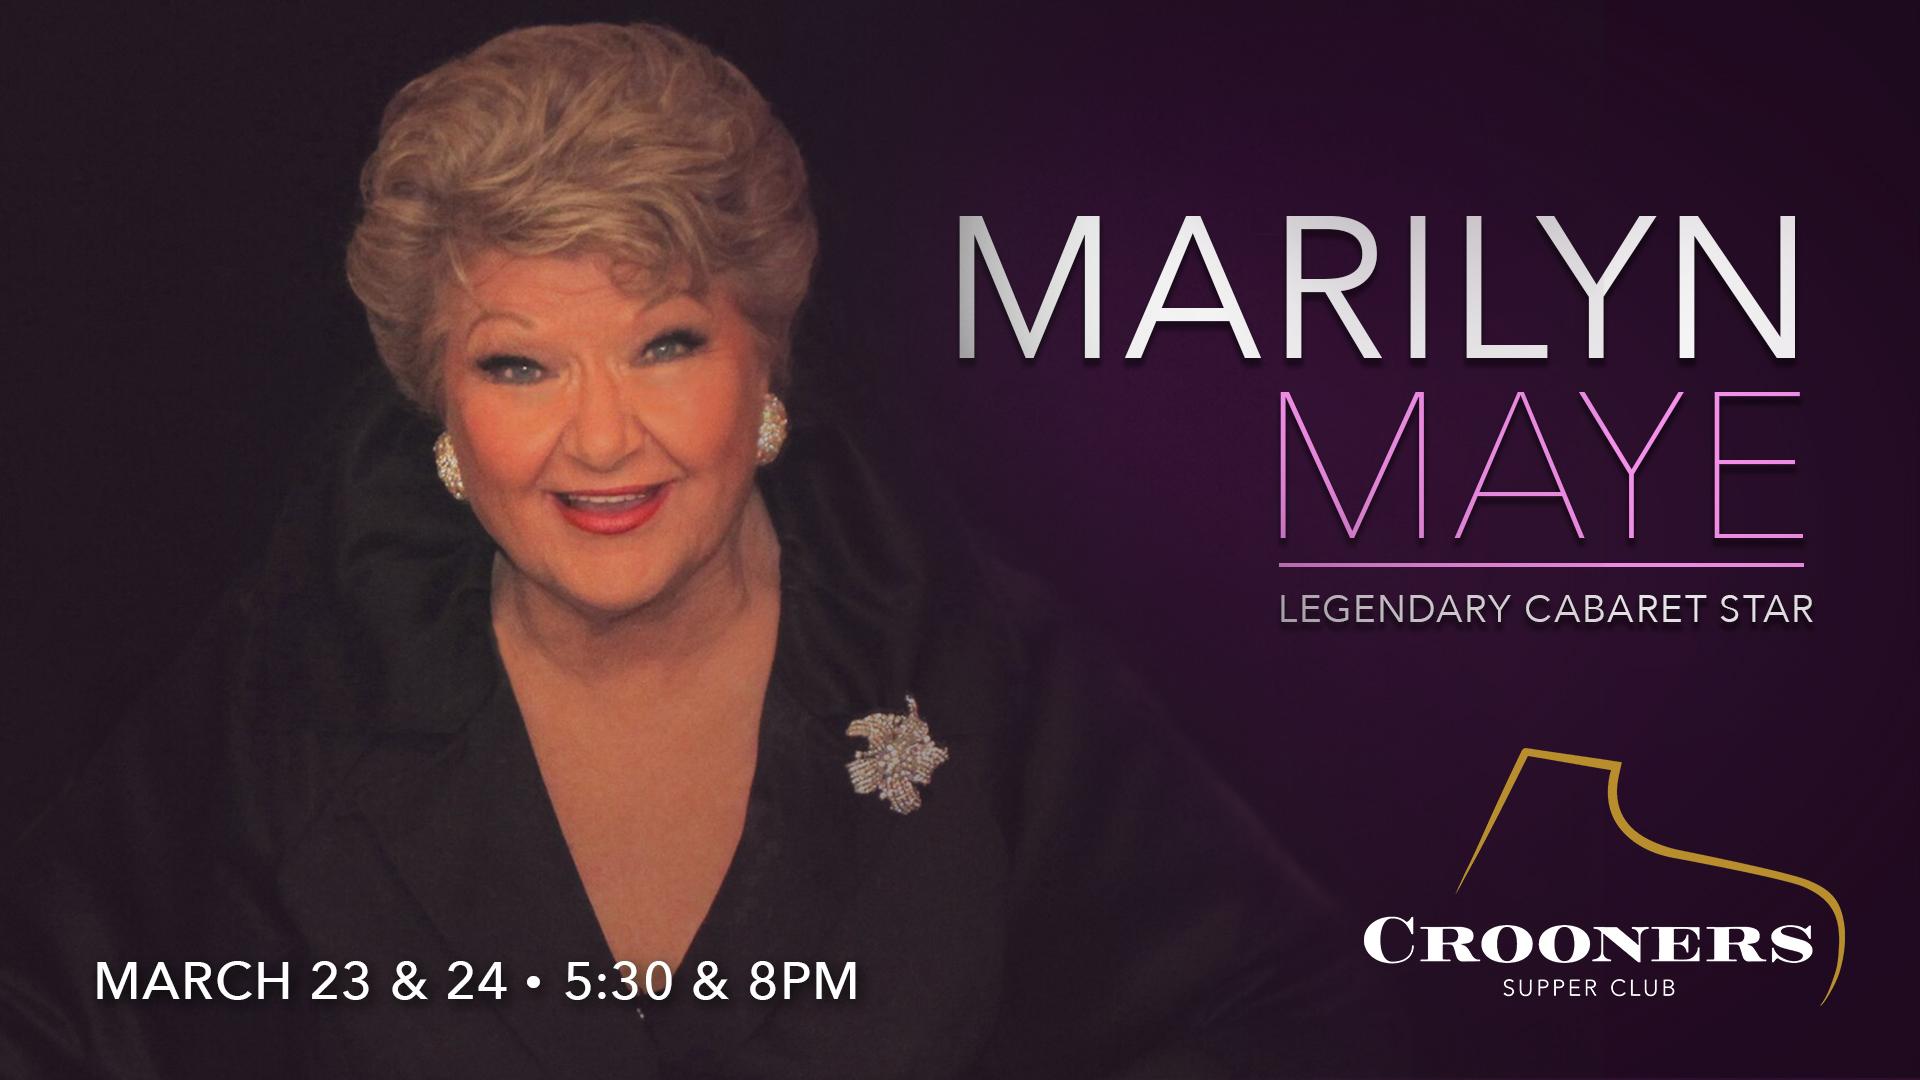 marilynmaye-crooners.jpg